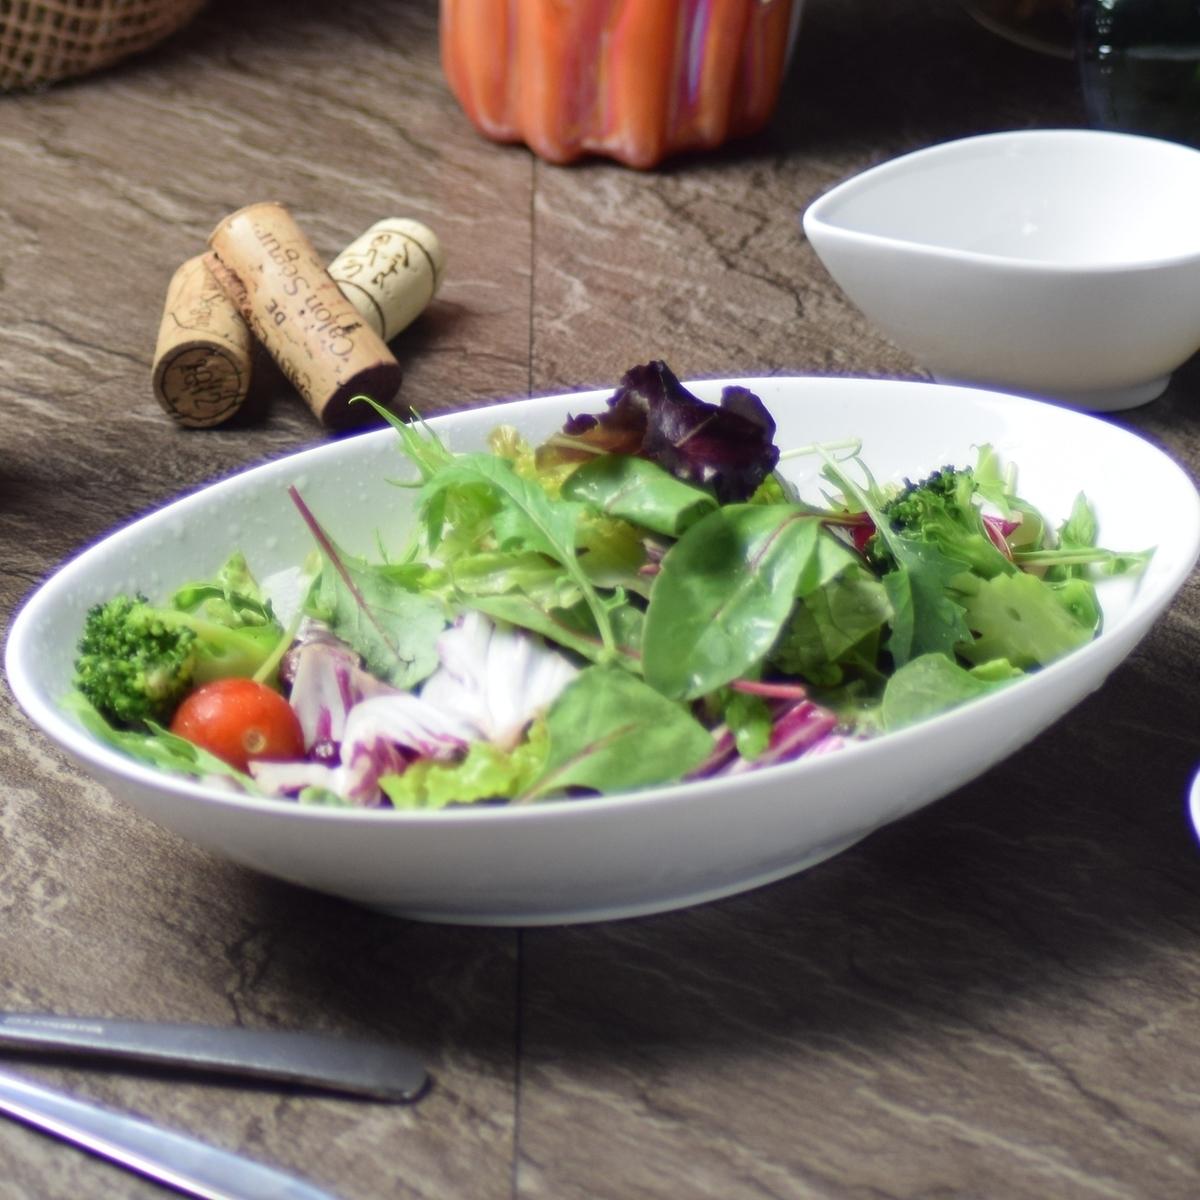 Yuya's mix vegetable salad